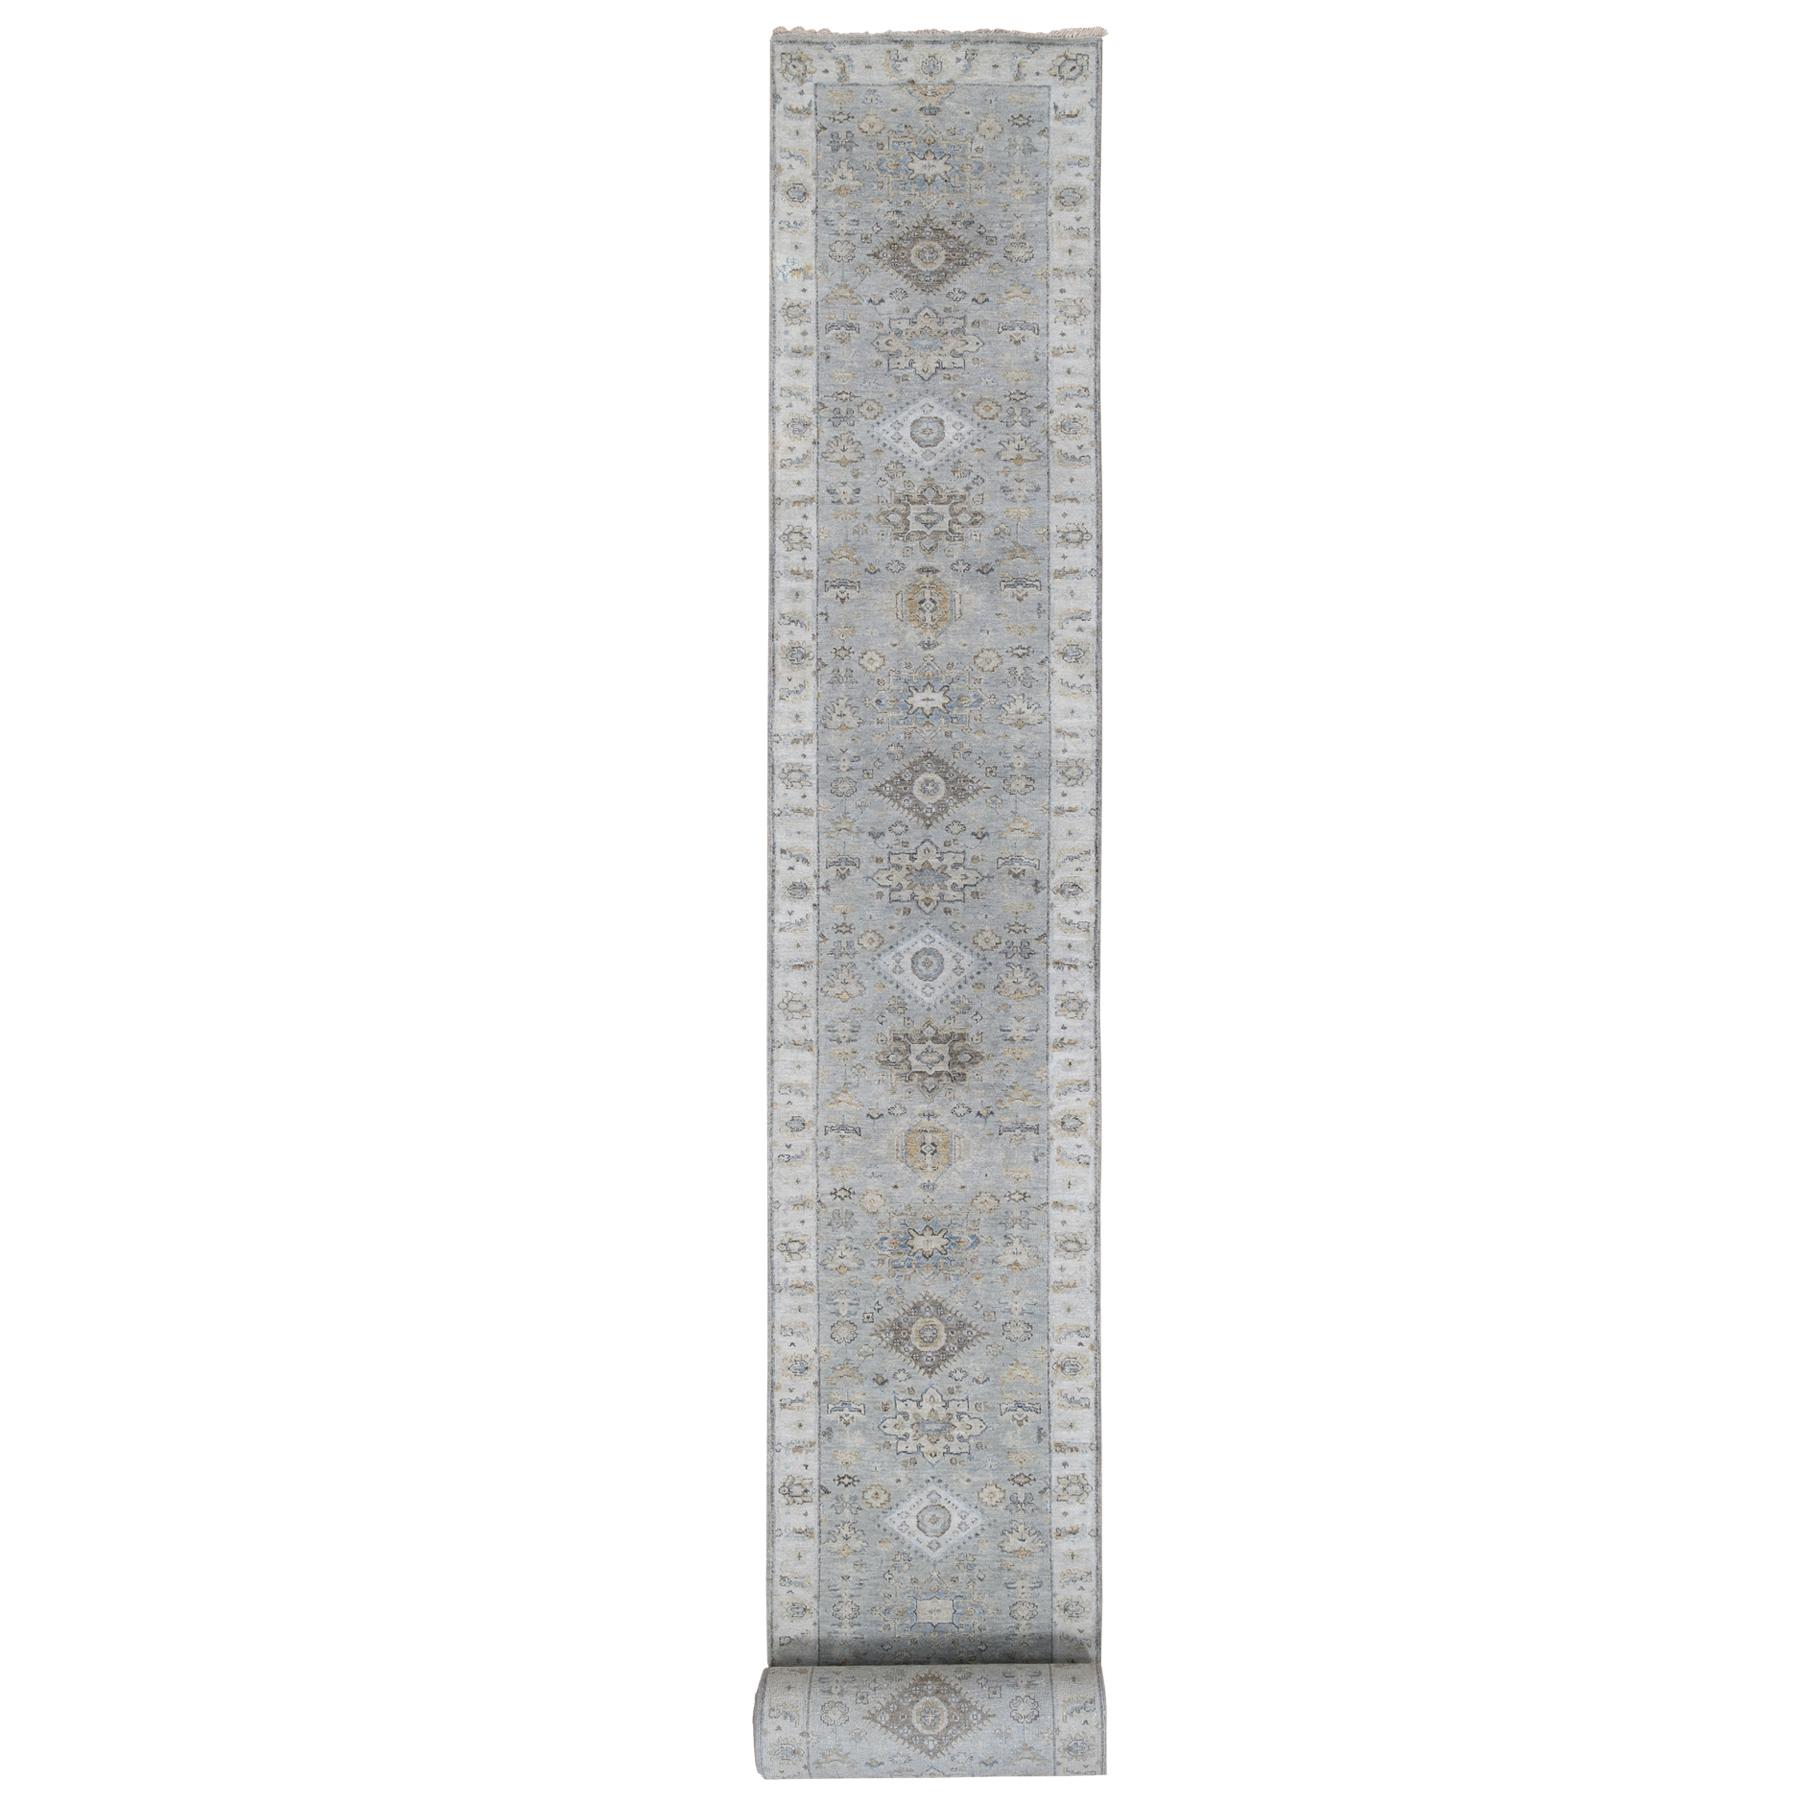 Serapi Heriz and Bakhshayesh Collection Hand Knotted Grey Rug No: 1124356